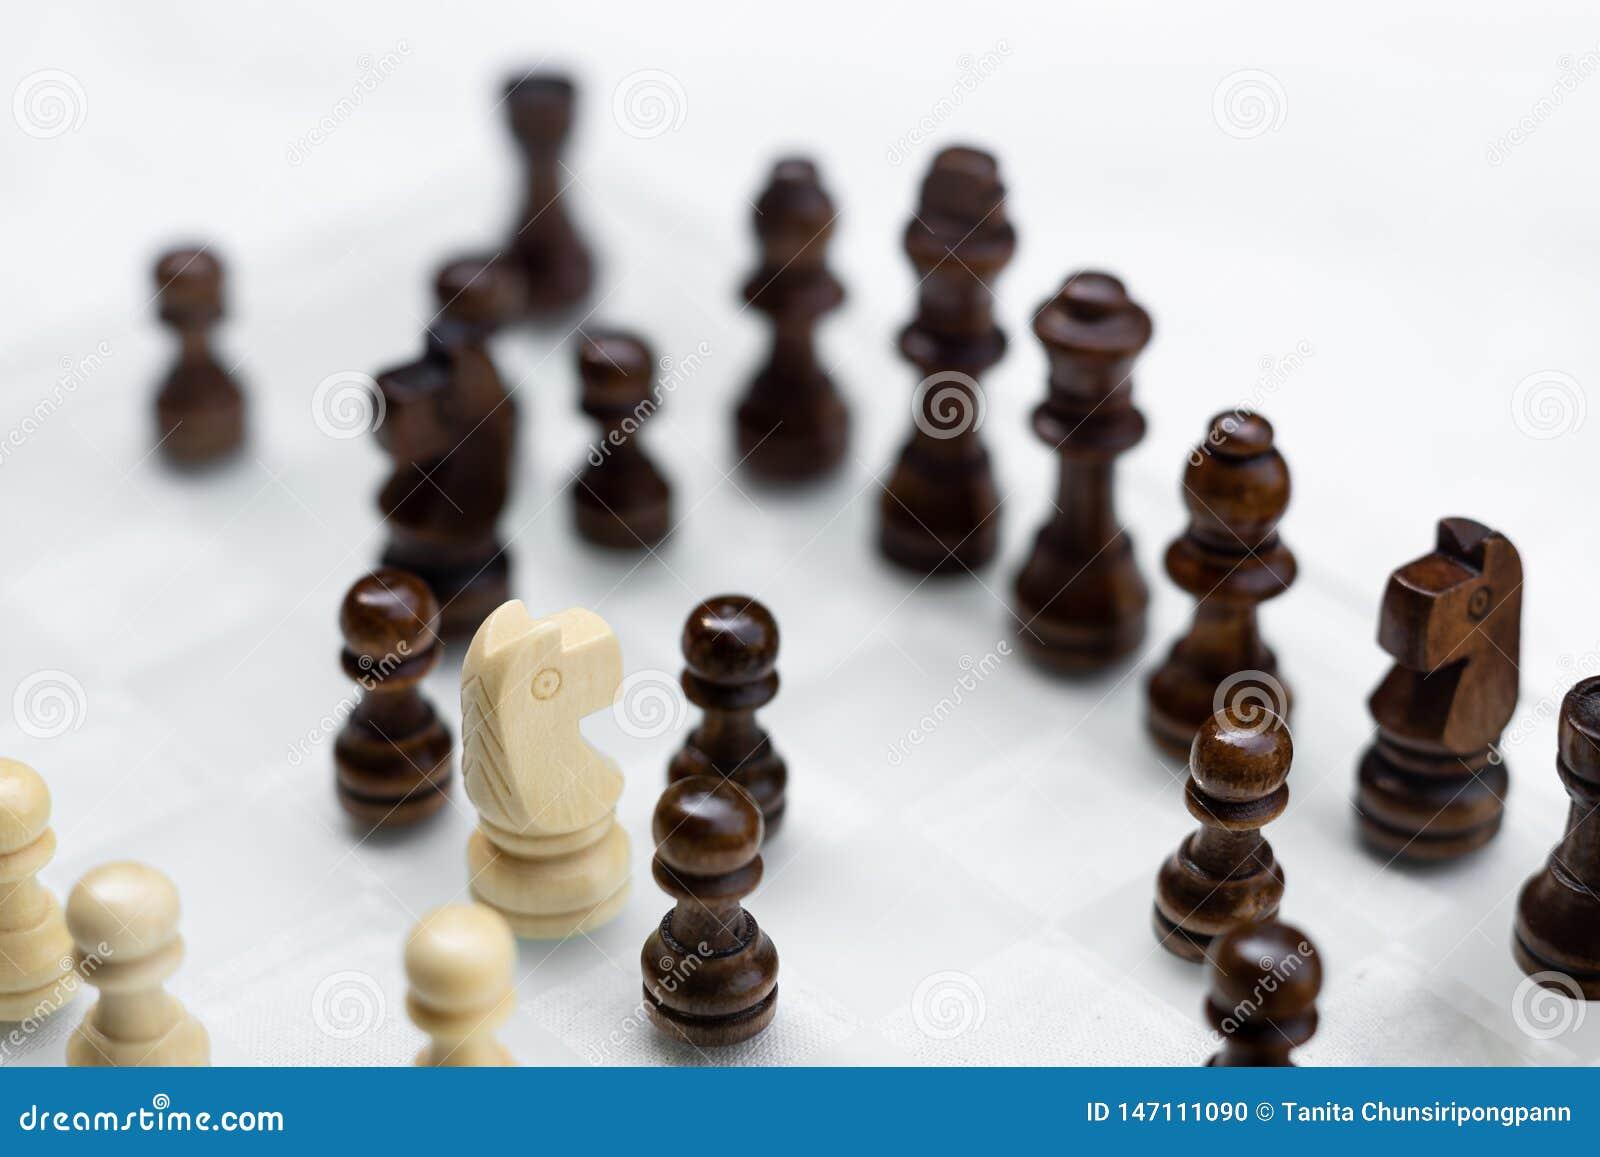 E Μια κίνηση που σκοτώνει Αναφερθείτε στη επιχειρησιακή στρατηγική και την ανταγωνιστική έννοια